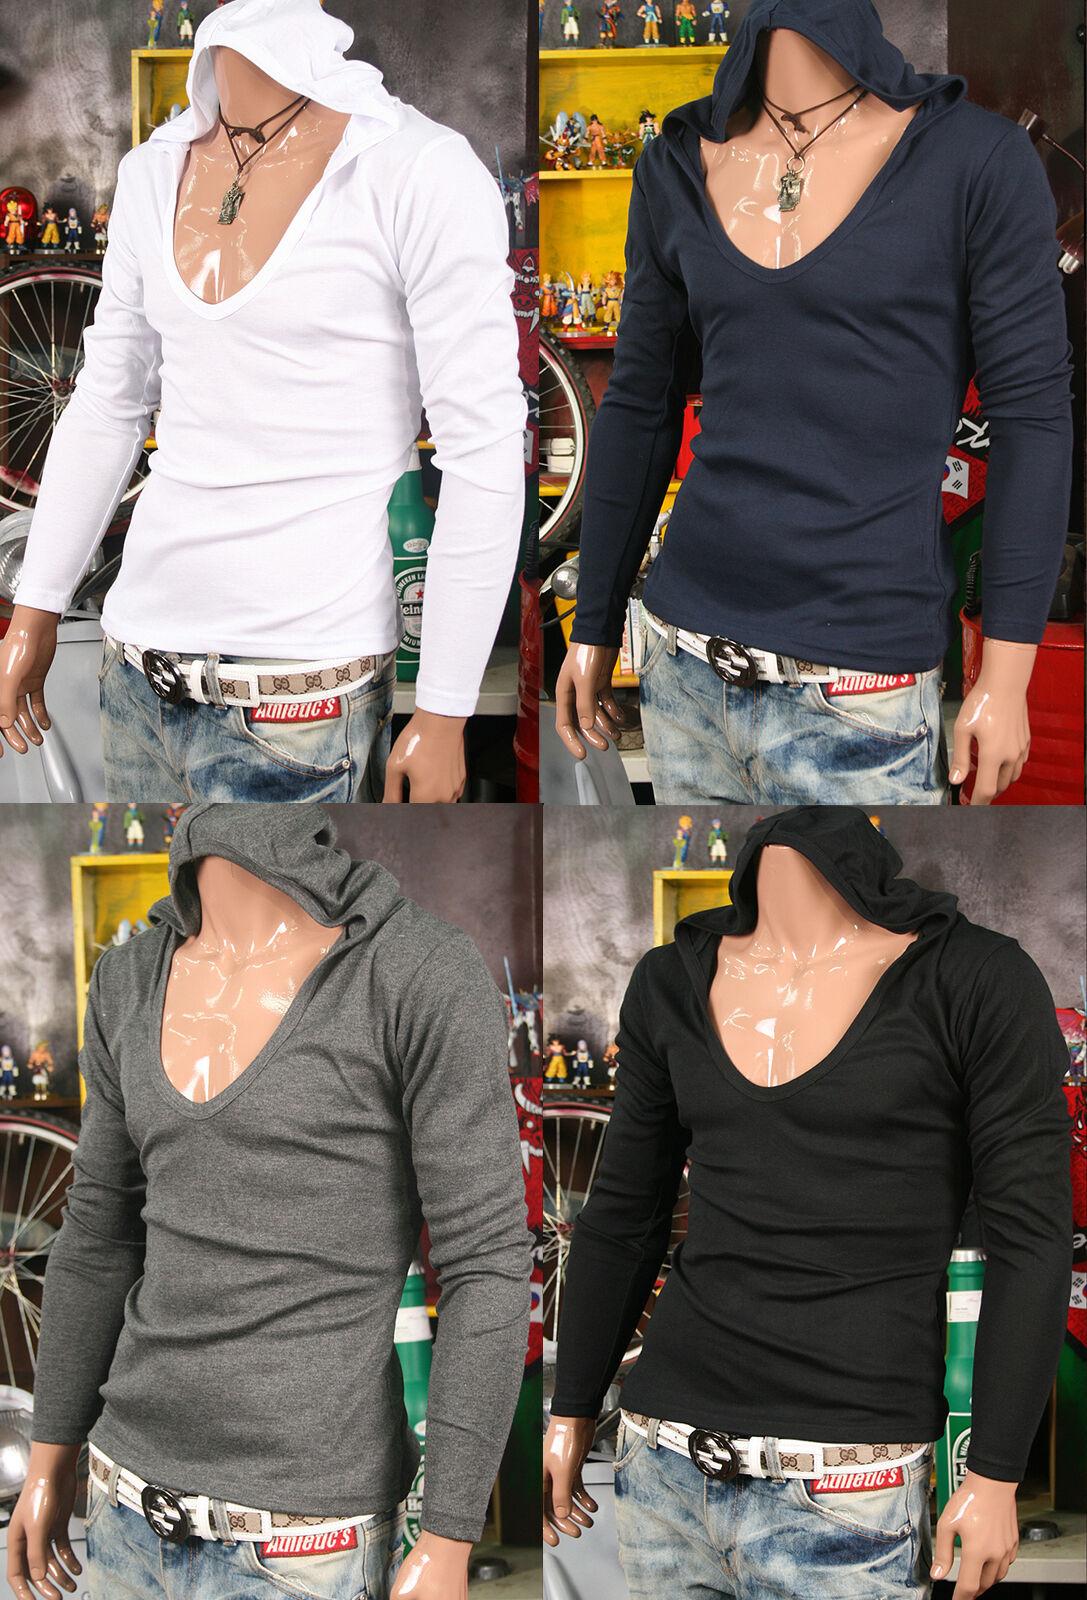 Mens slim fitting deep v neck t shirt with hoodie Unisex jersey jumper hoodies